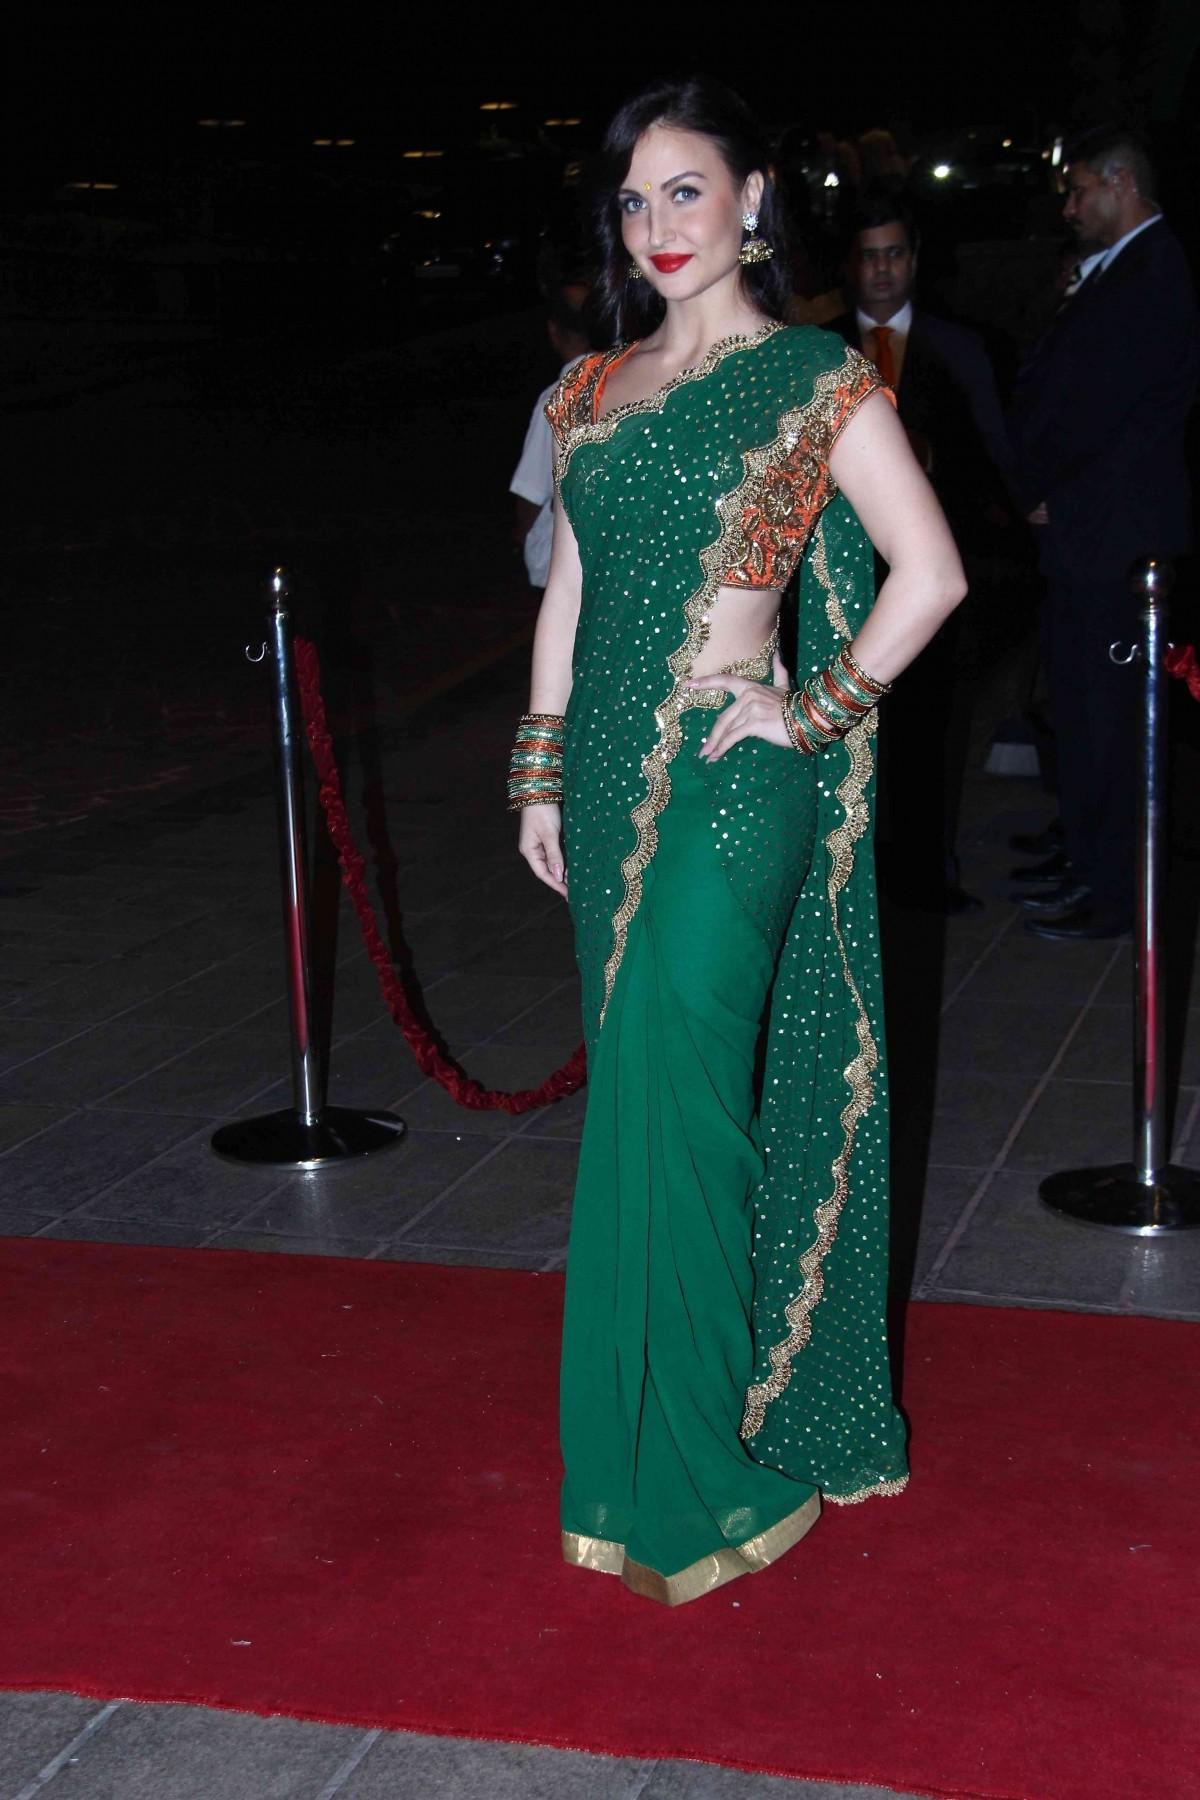 Katrina Kaif, Jacqueline Fernandez, Sangeeta Bijlani and Other Salman Khan's Ex-girlfriends attended Arpita Khan's Wedding Ceremonies